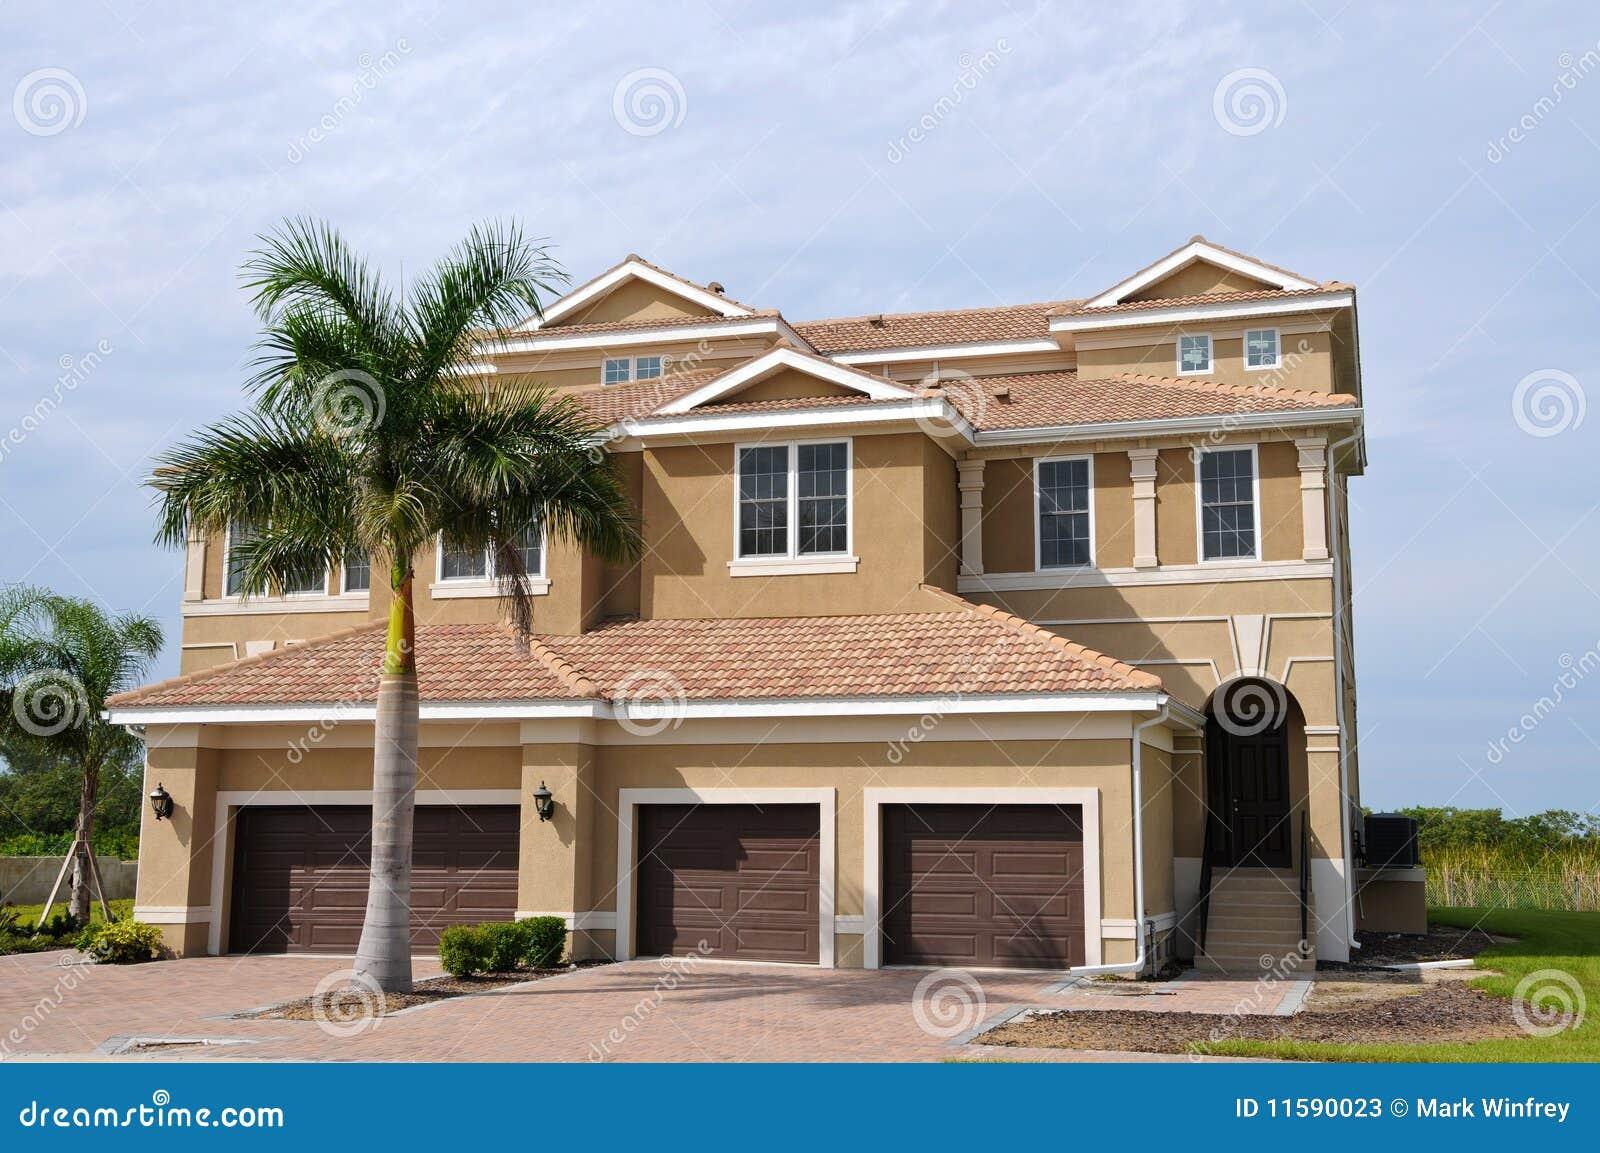 Florida House stock image  Image of grass, palm, beach